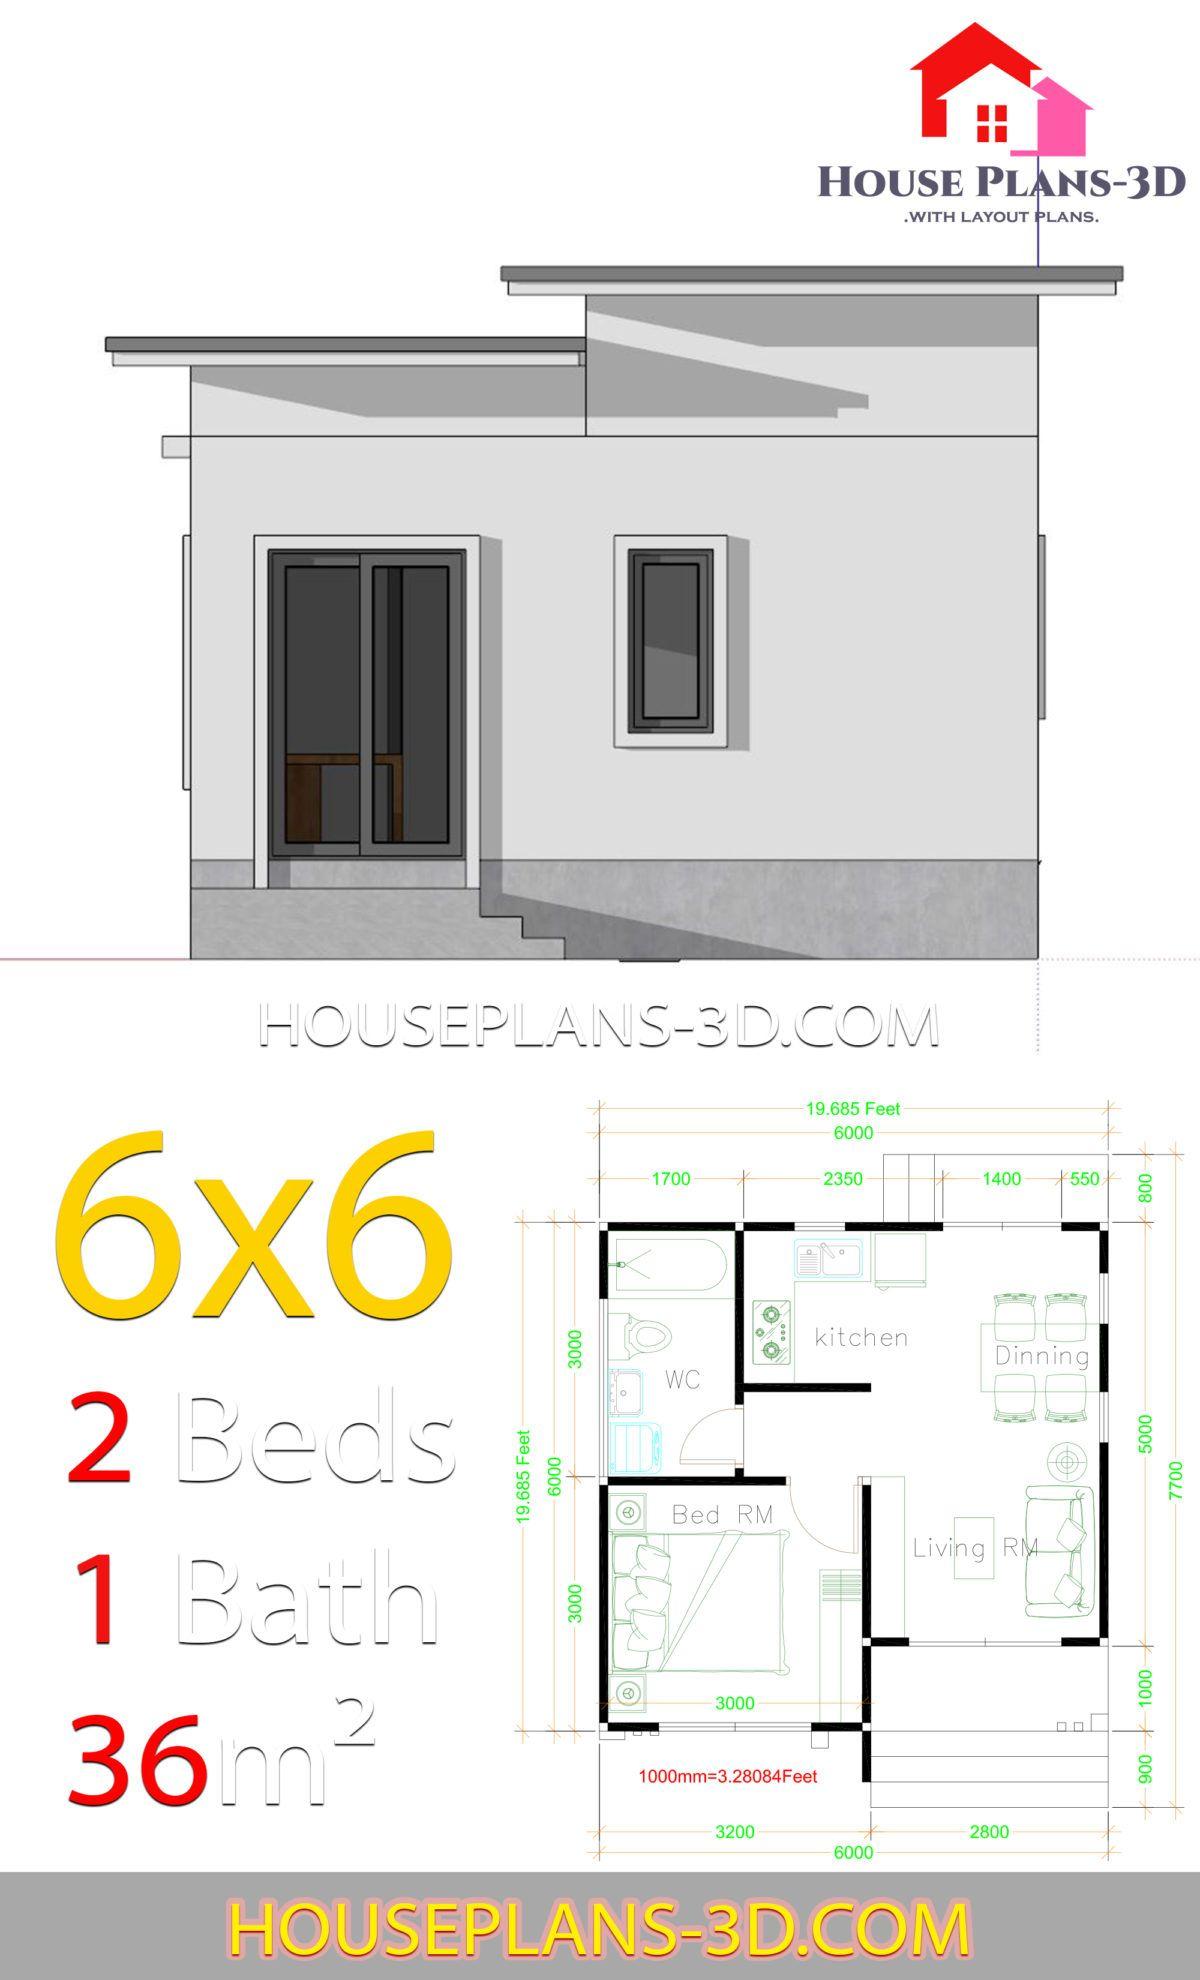 House Plans 6x6 With One Bedrooms Flat Roof House Plans 3d Denah Rumah Rumah Pedesaan Rumah Modern